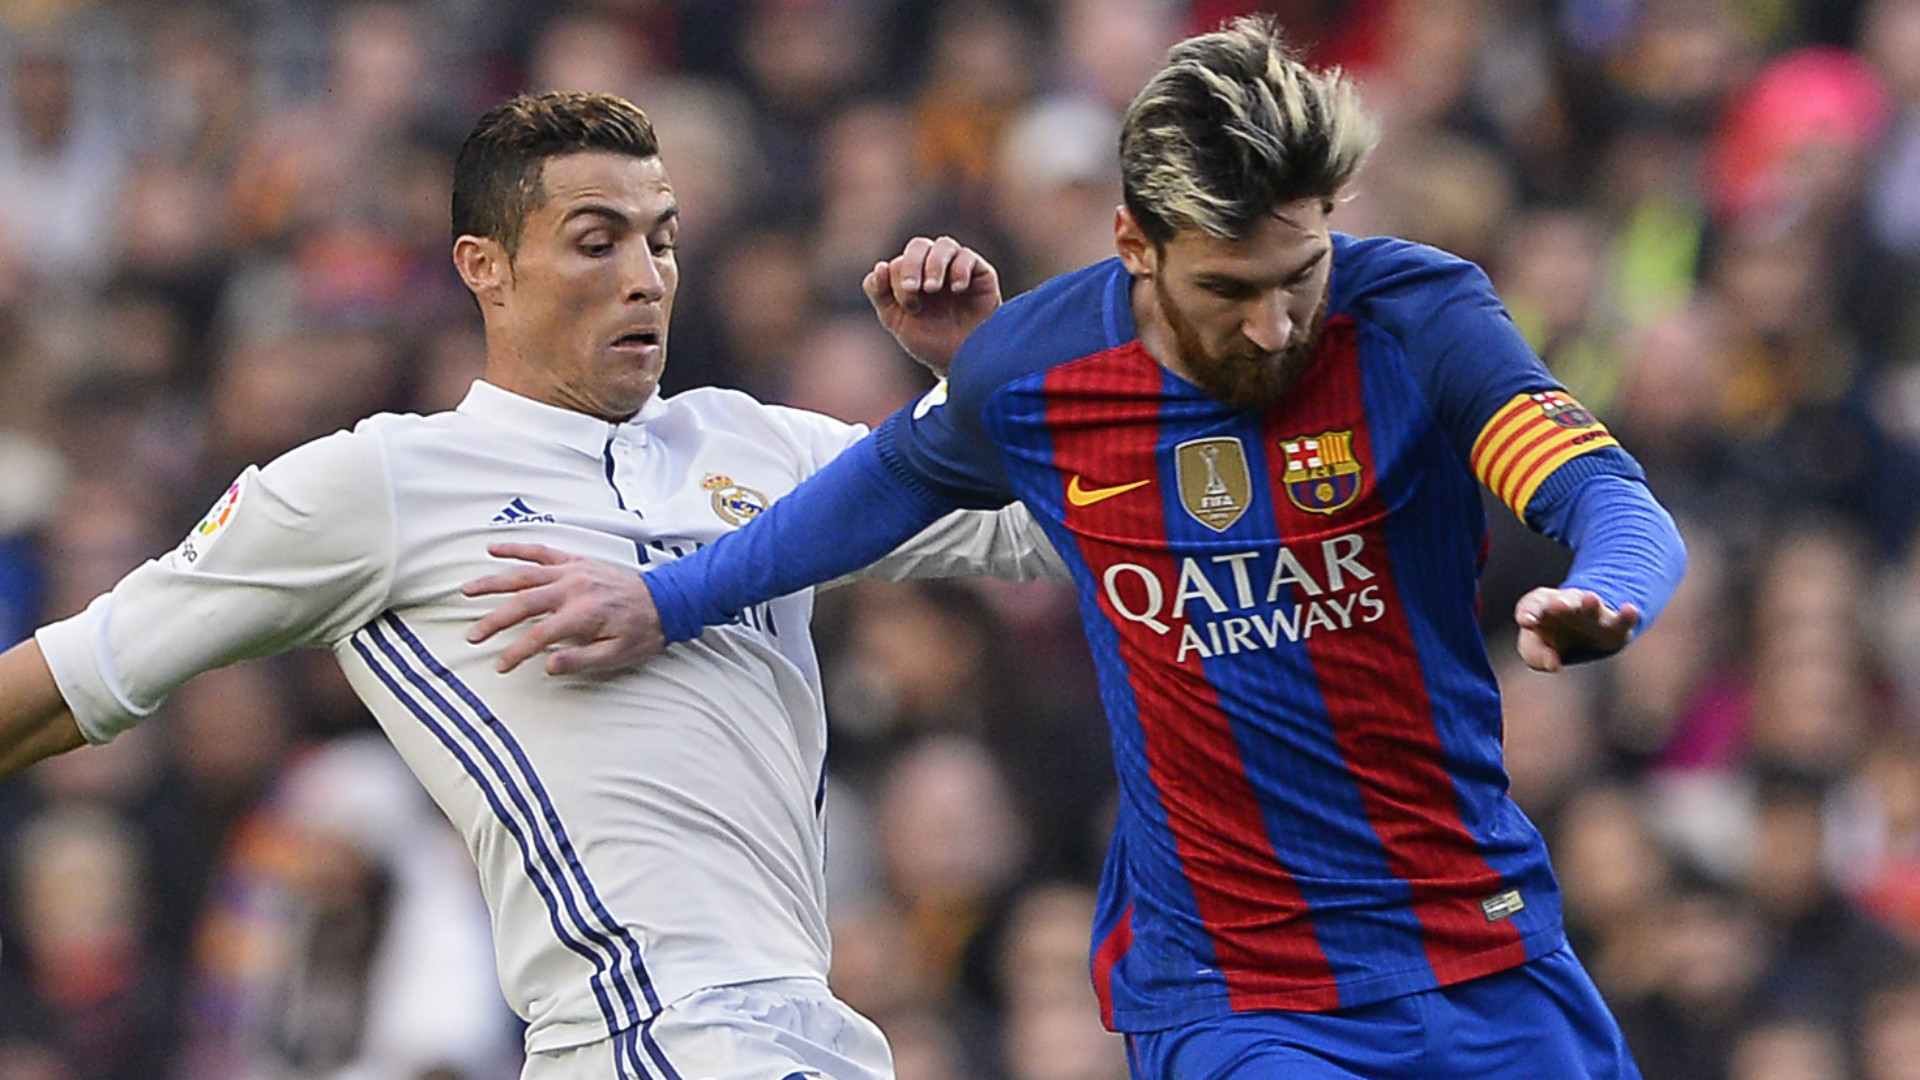 Alaves-Real Madrid: Zinedine Zidane espère qu'Enzo, son fils, ne marquera pas